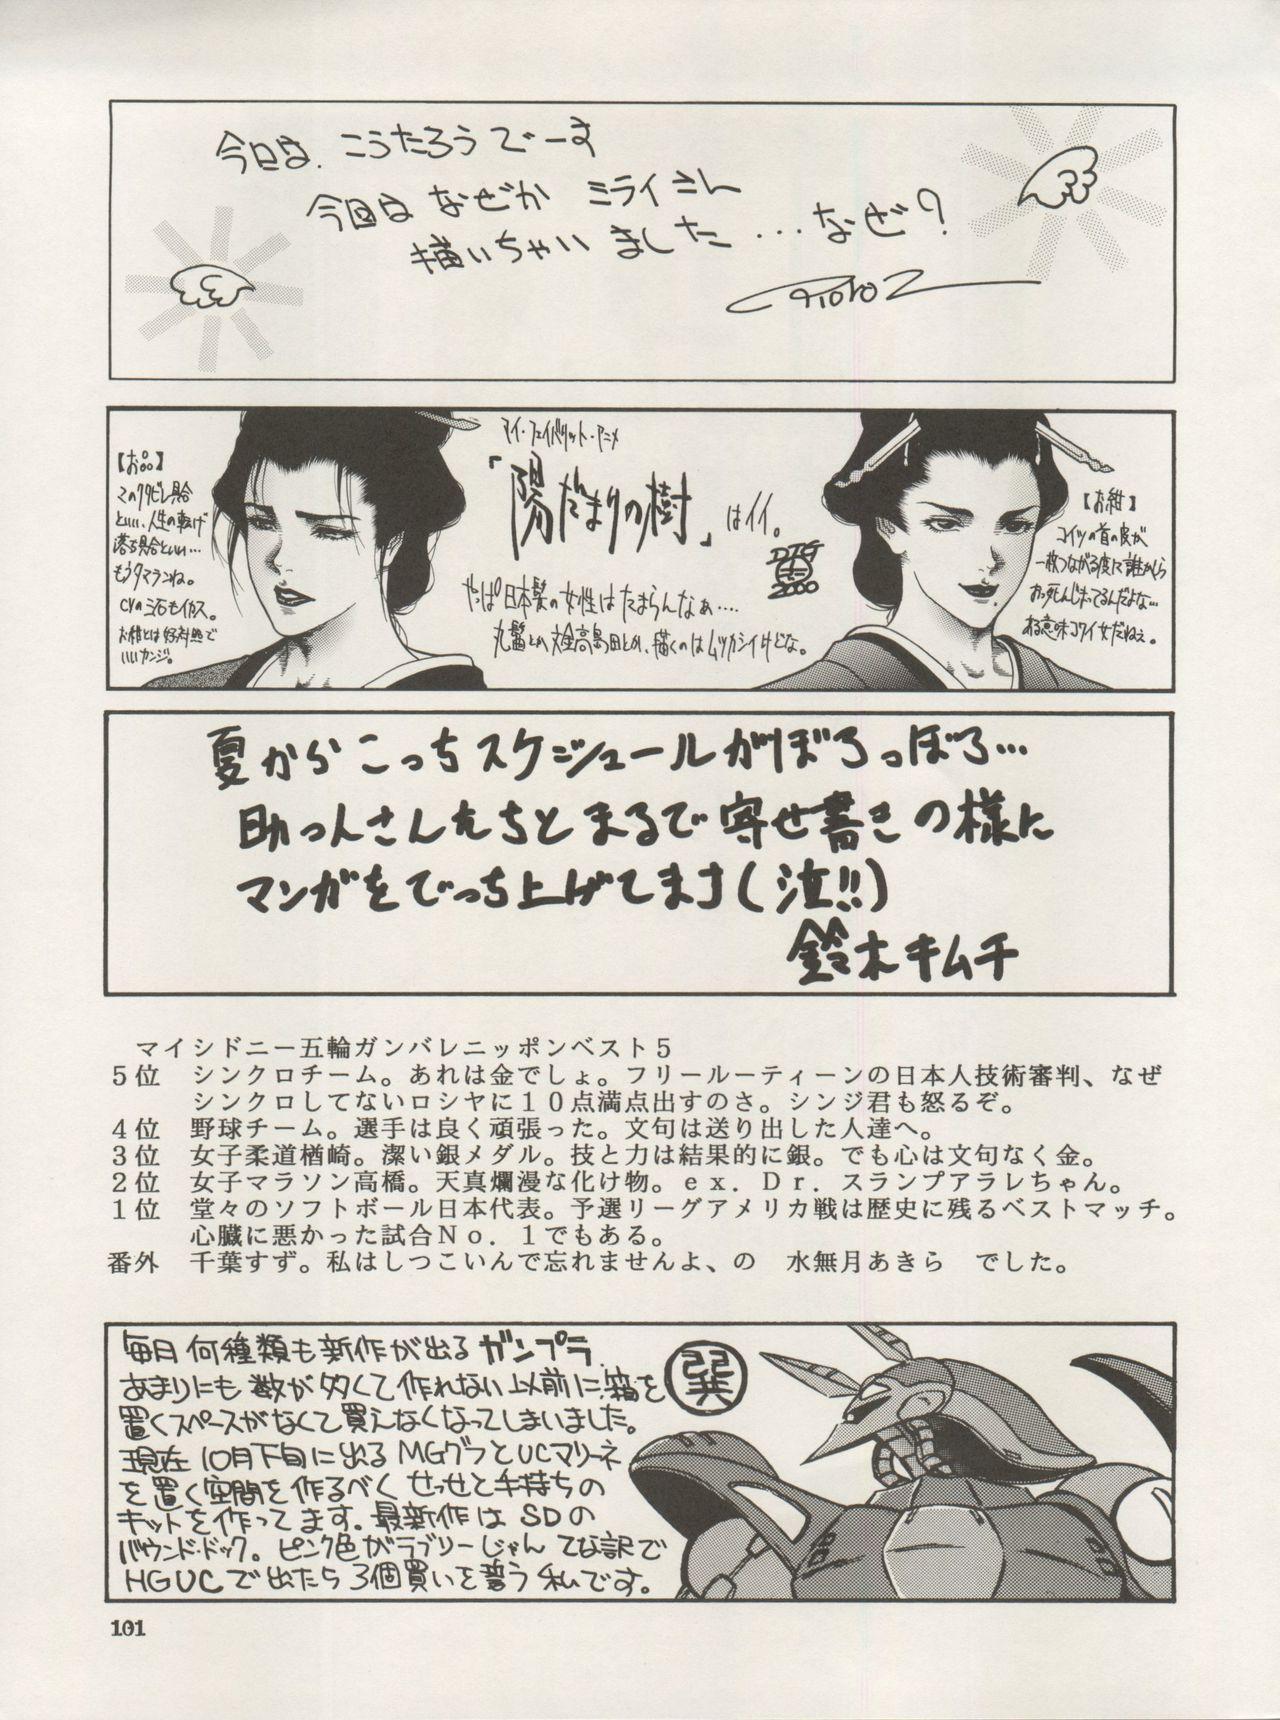 NEXT Climax Magazine 3 Gundam Series 100